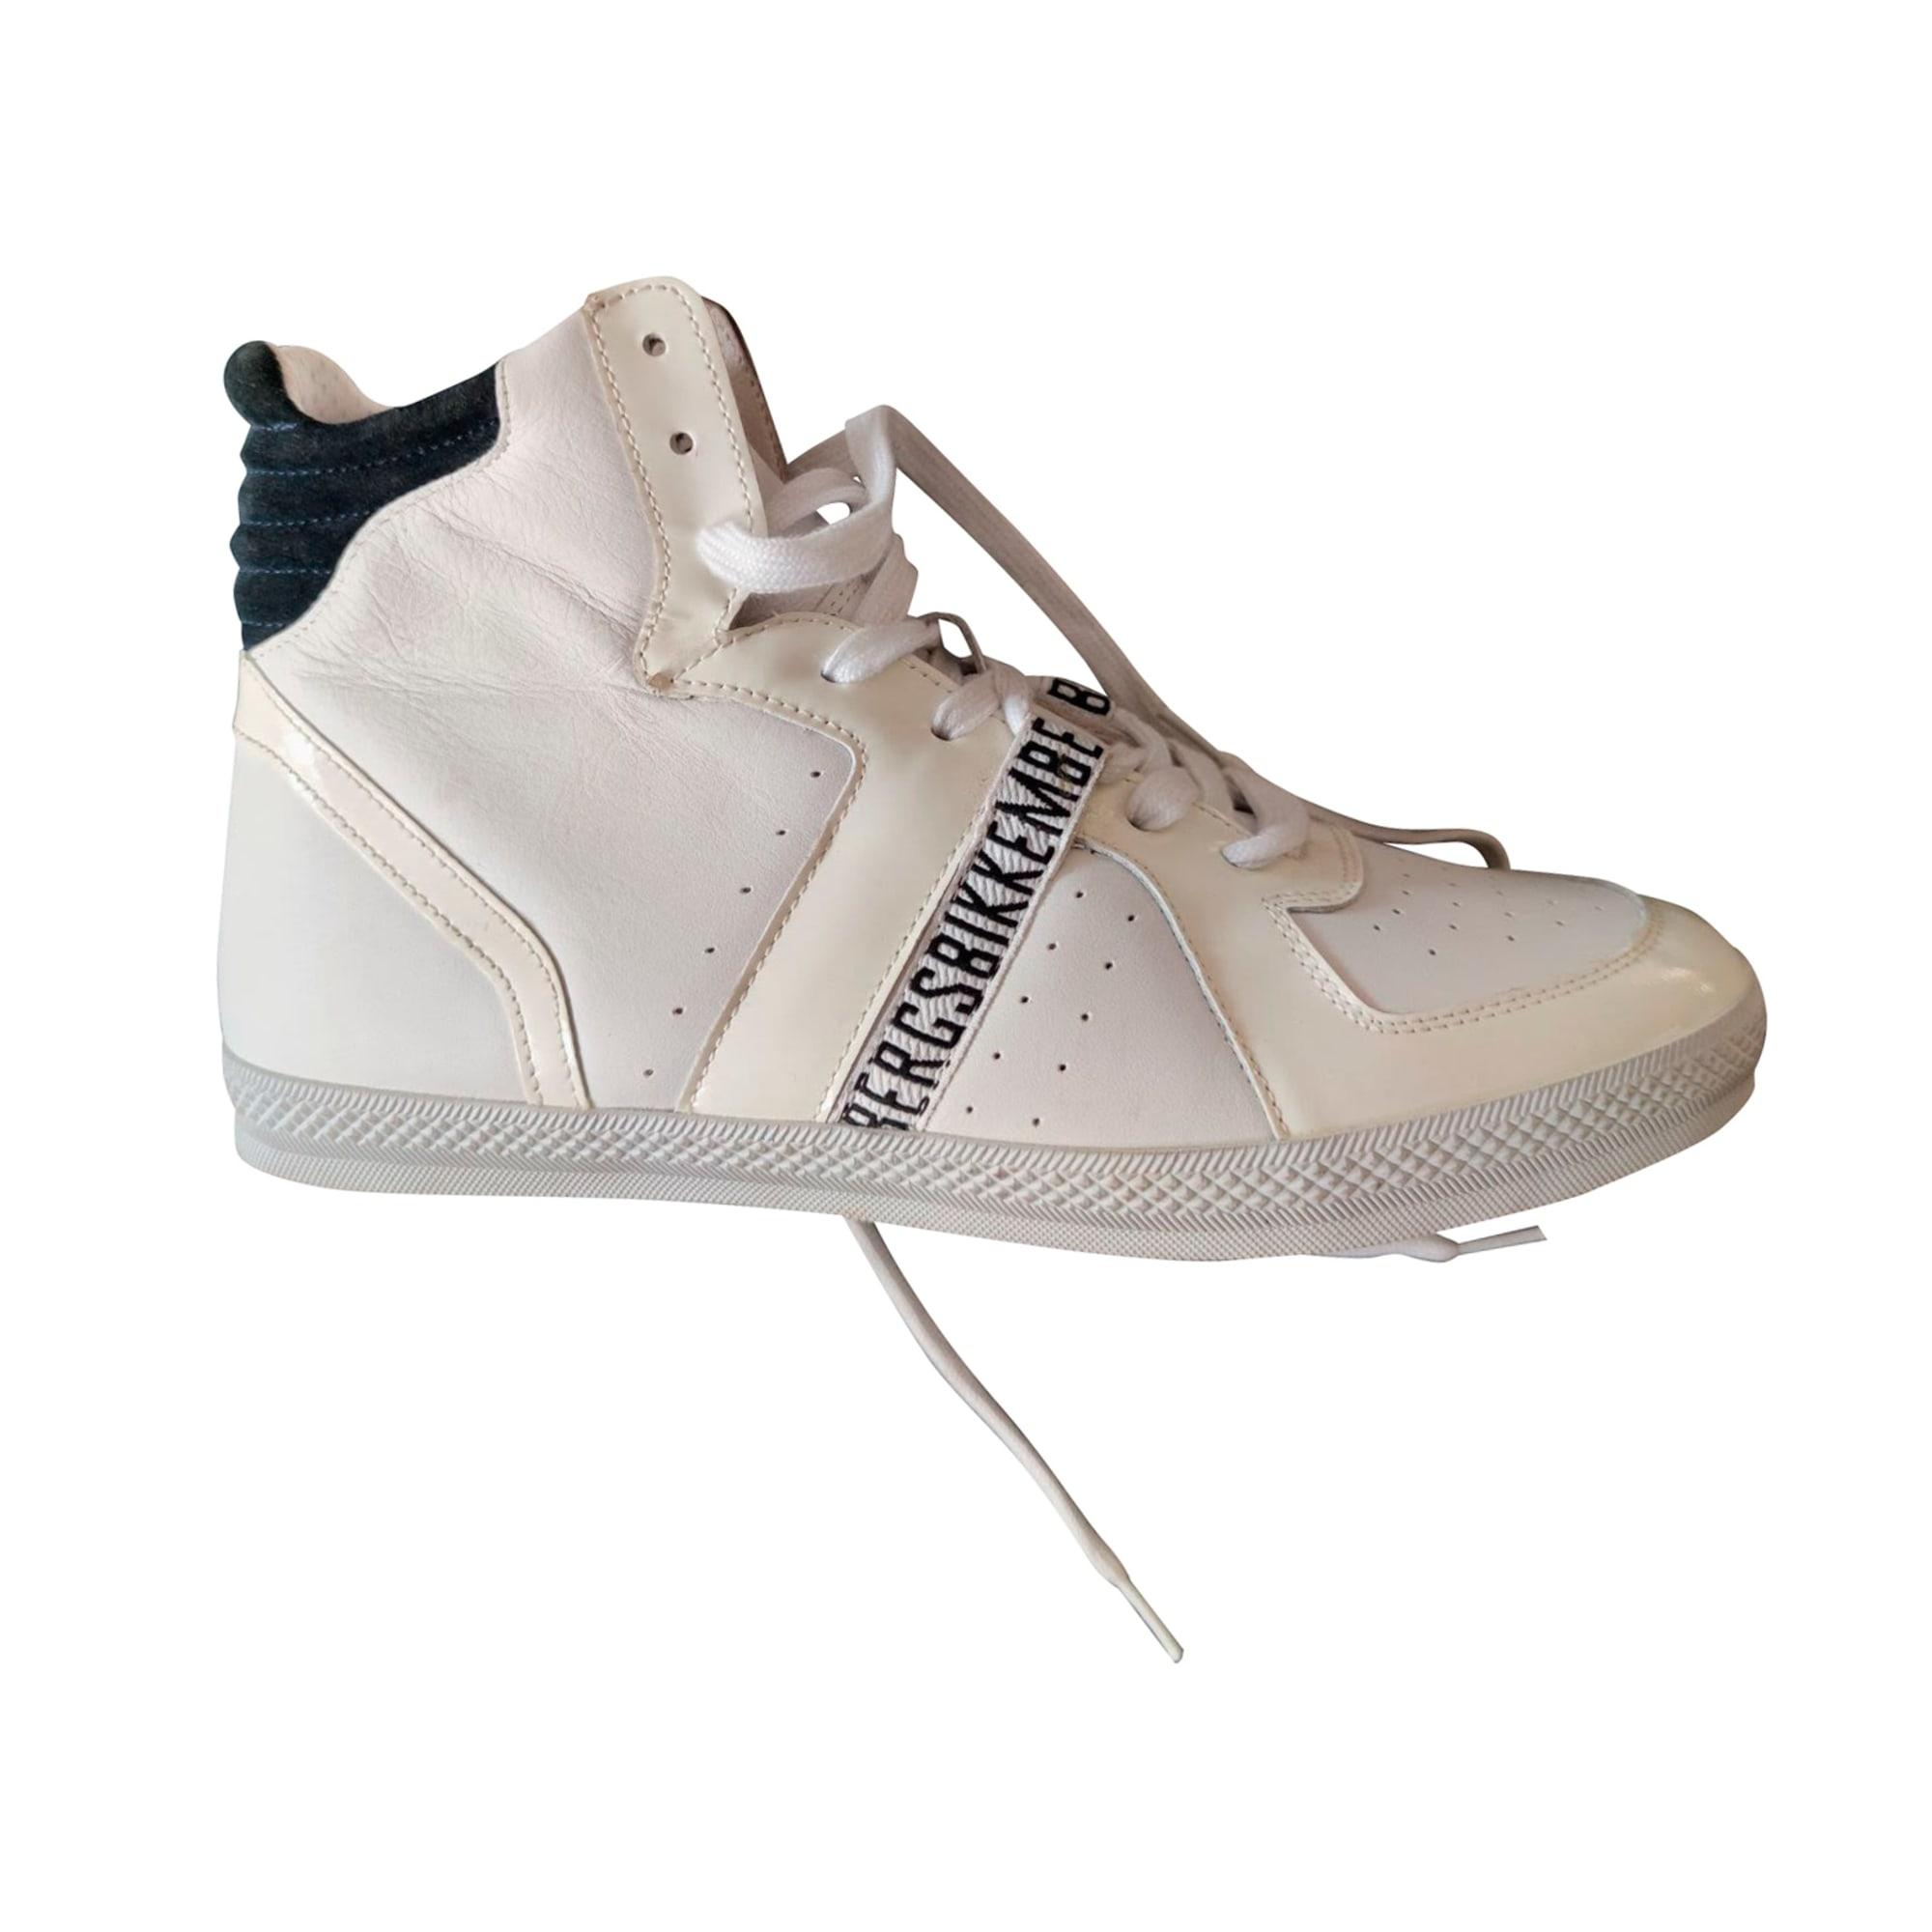 Baskets DIRK BIKKEMBERGS Blanc, blanc cassé, écru